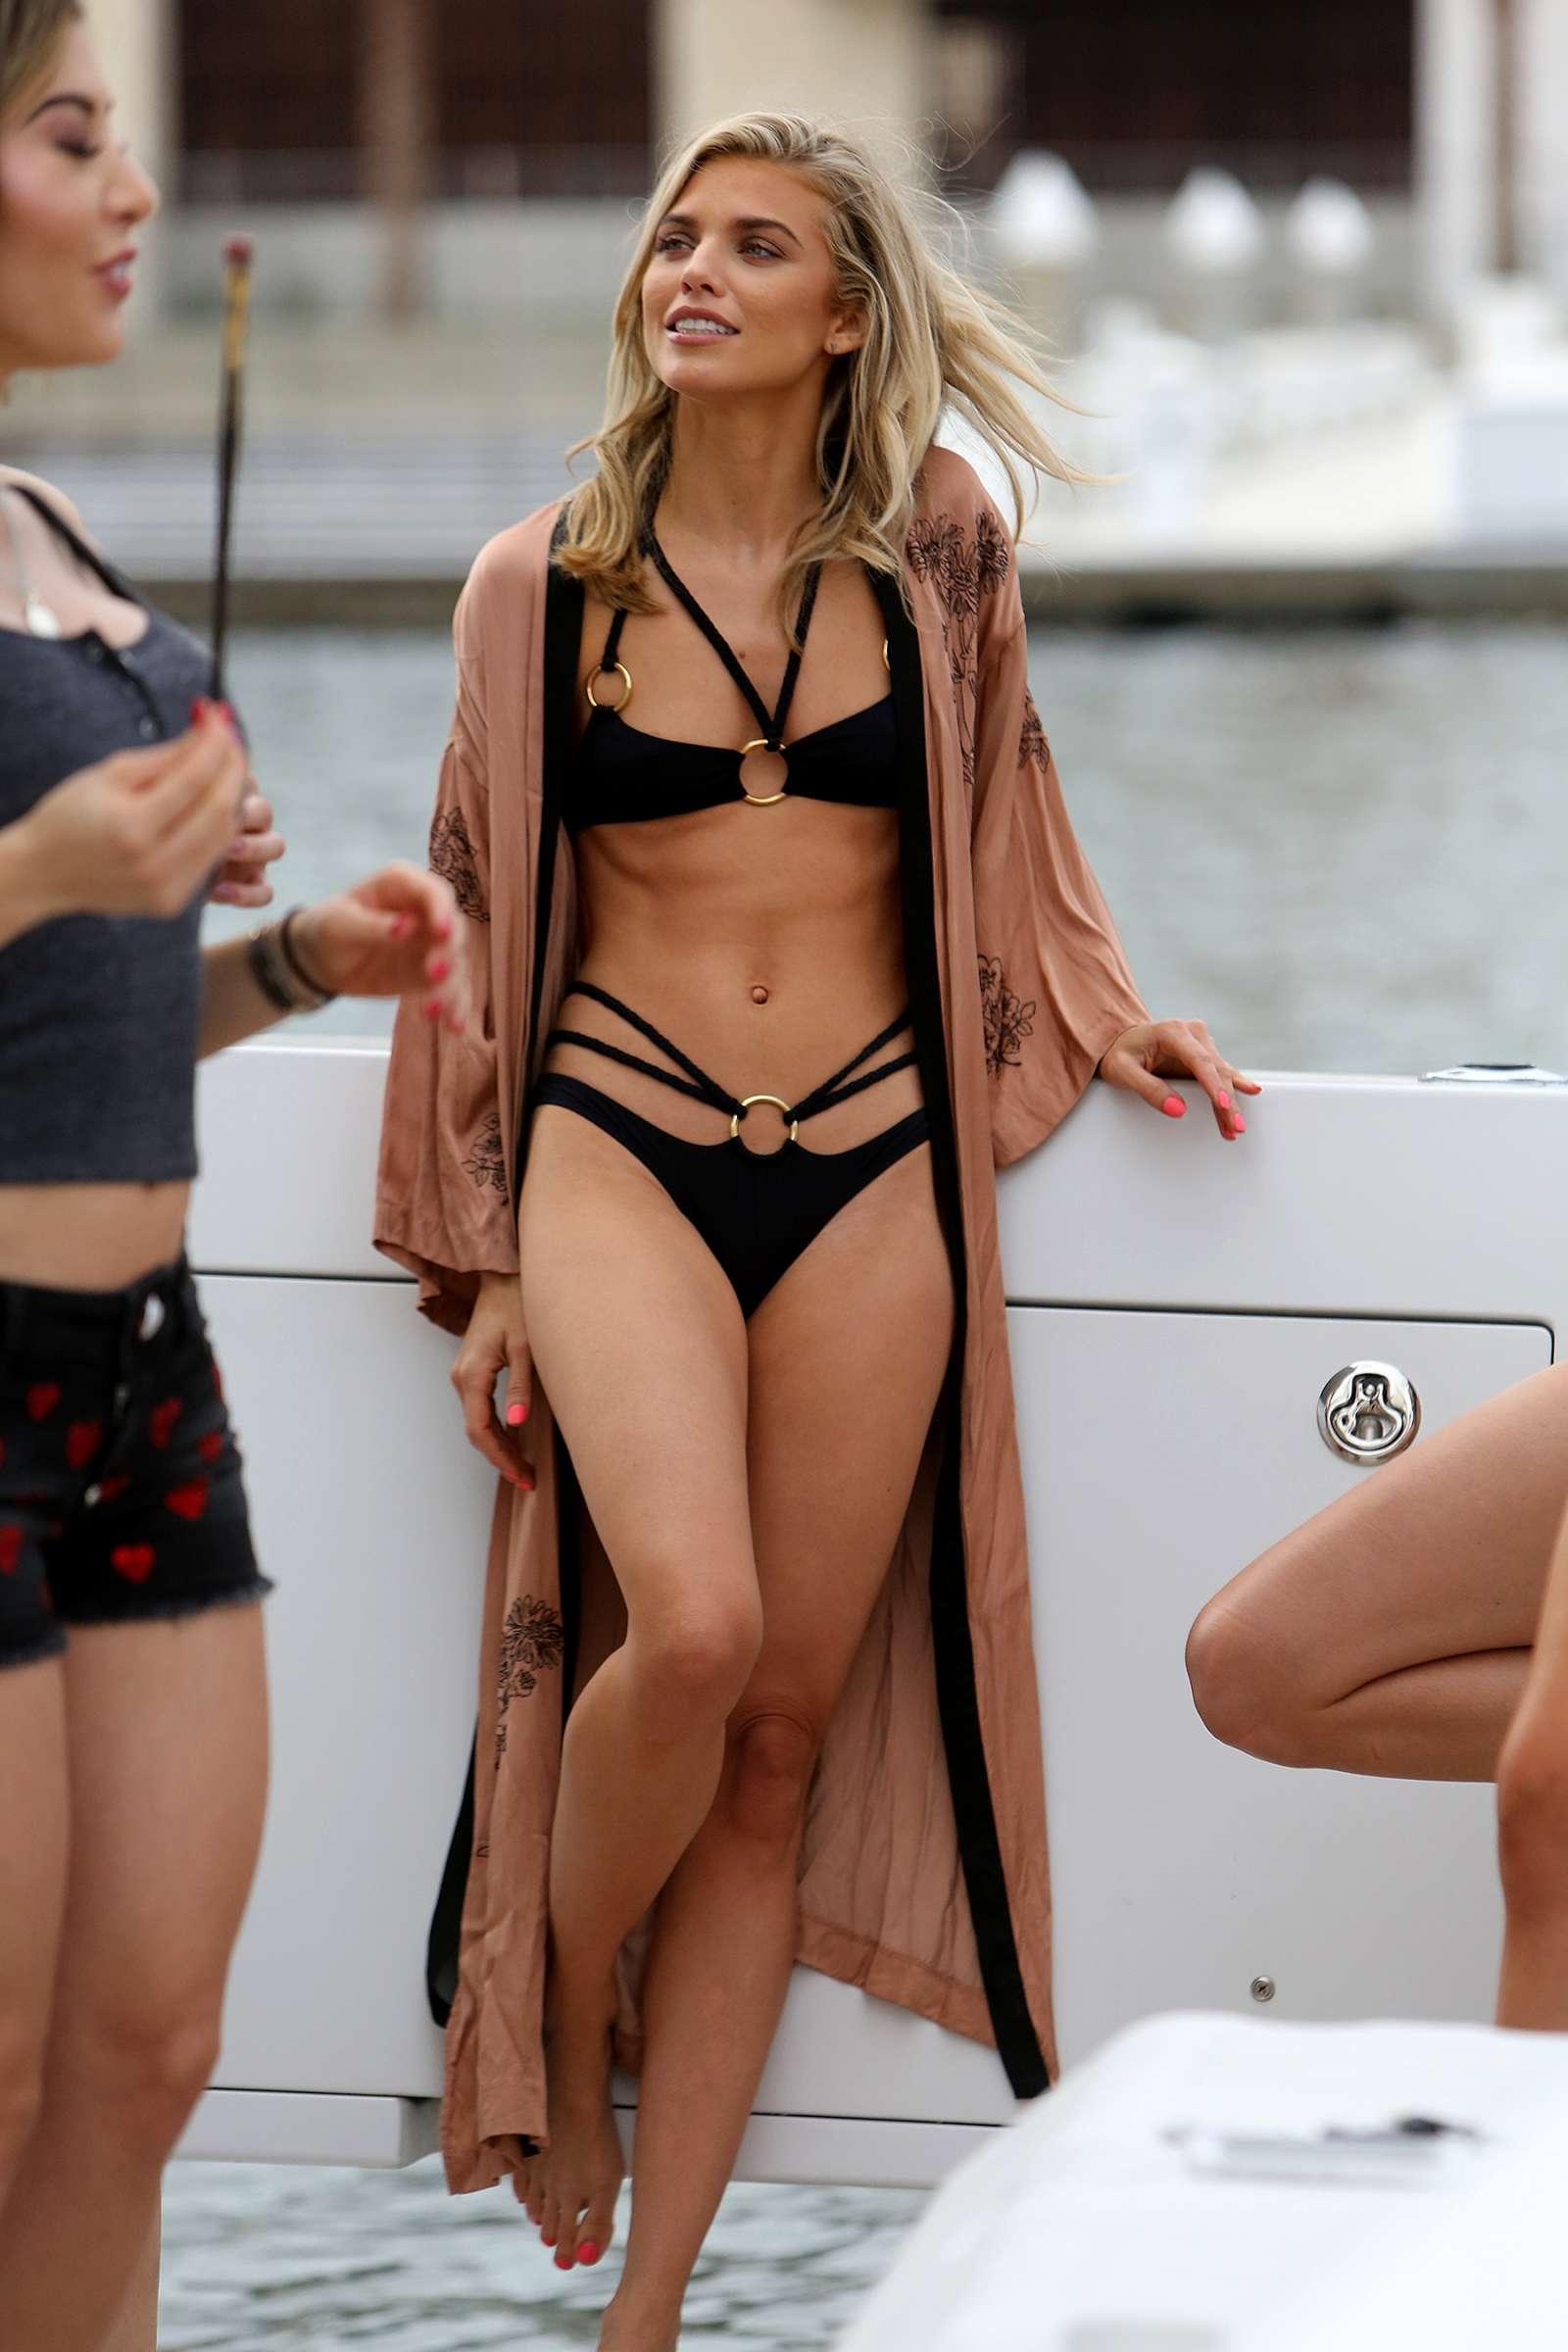 Annalynne McCord in Black Bikini in Los Angeles